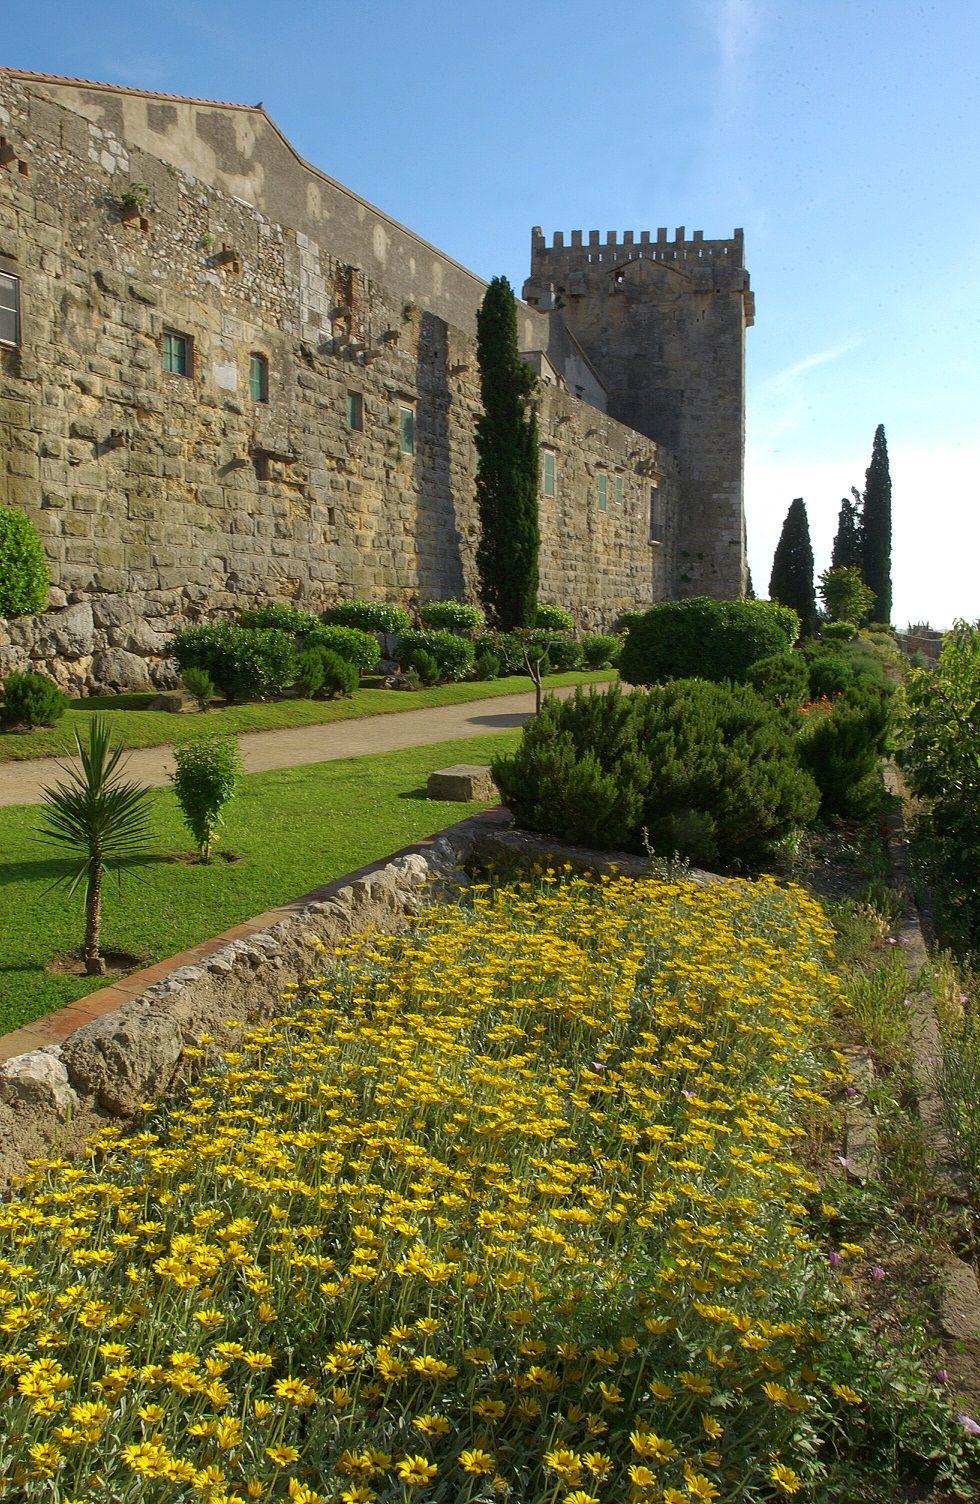 A los pies de la muralla de #Tarragona